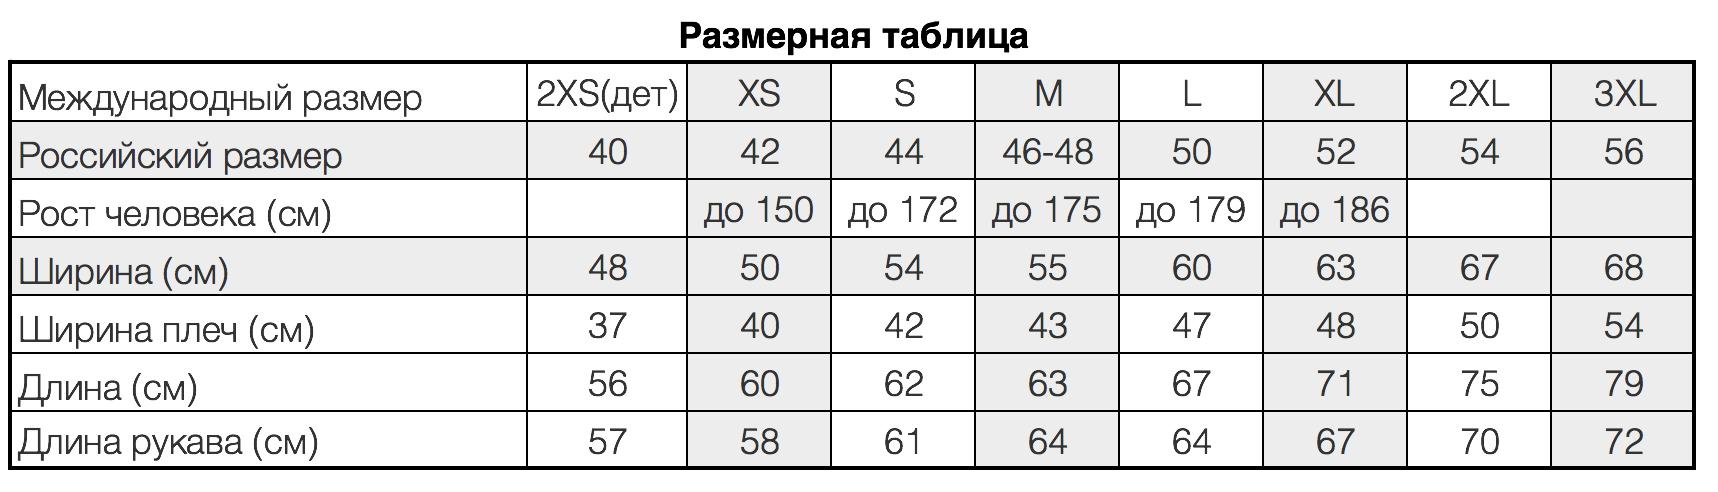 размерная таблица теплых толстовок